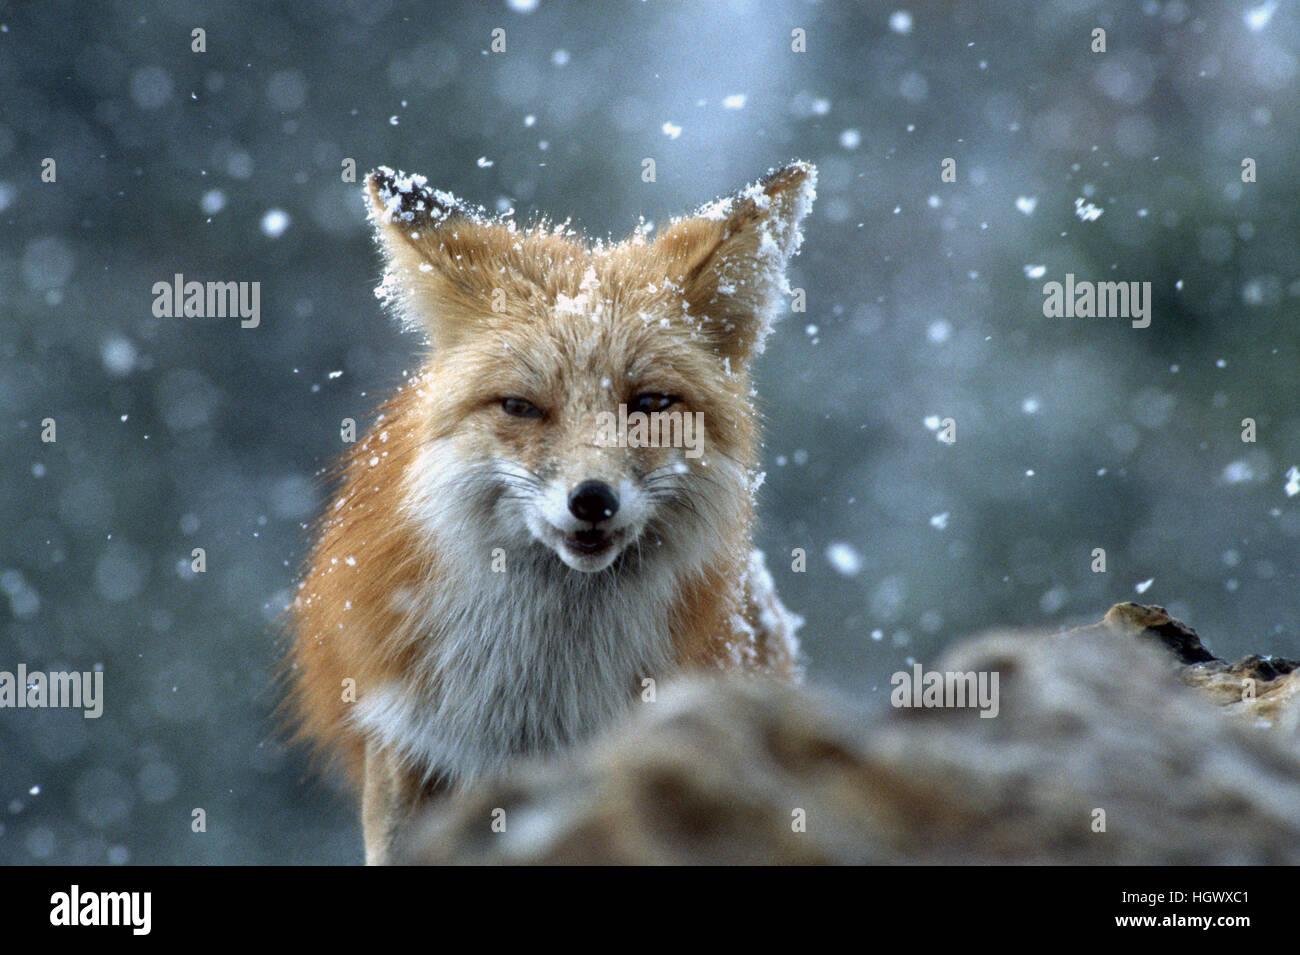 Fox avec look menaçant Photo Stock